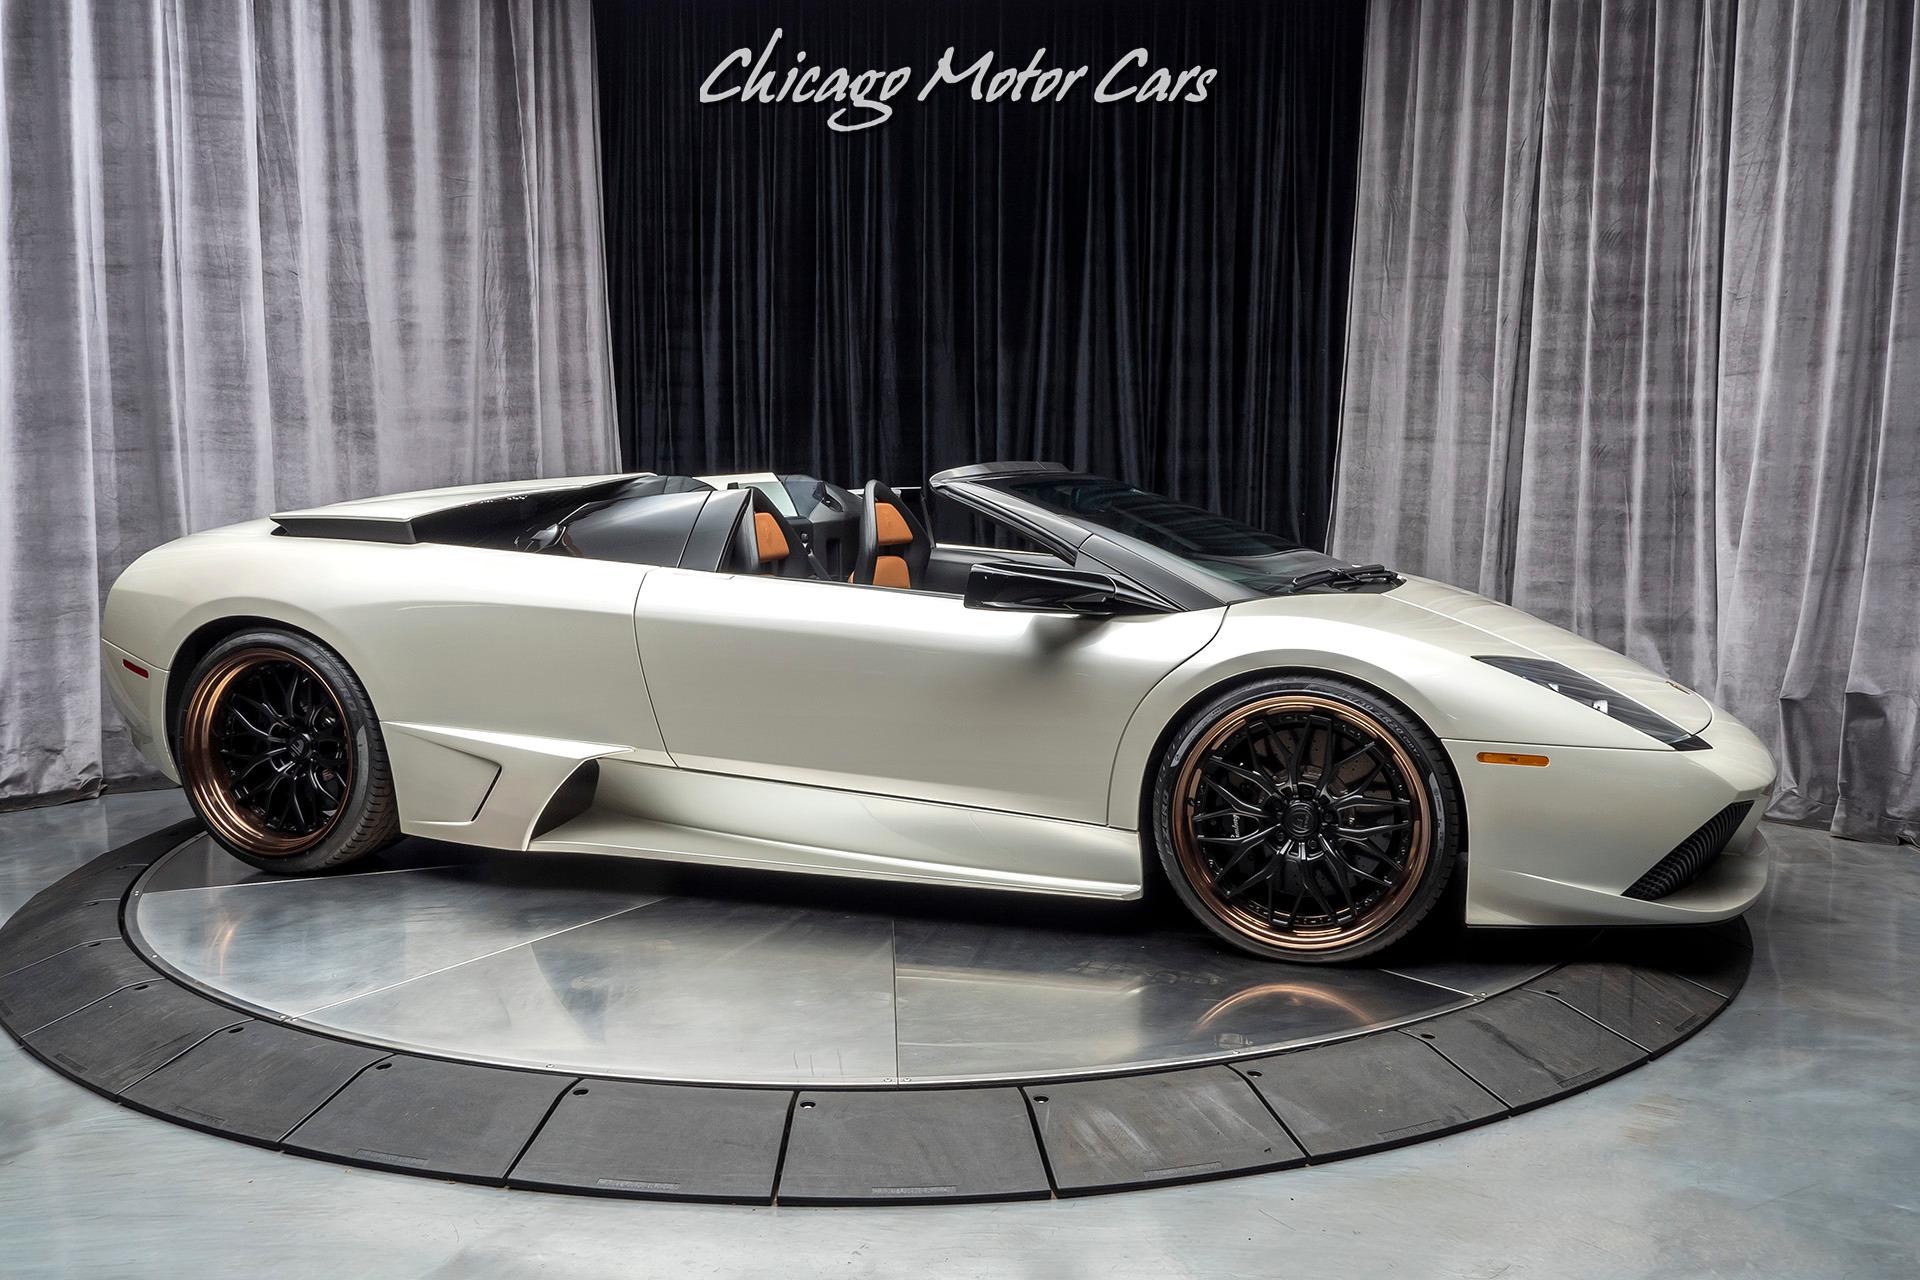 Used-2008-Lamborghini-Murcielago-LP640-Roadster-7k-Miles-Incredible-and-Rare-Color-Combo-ANRKY-Wheels